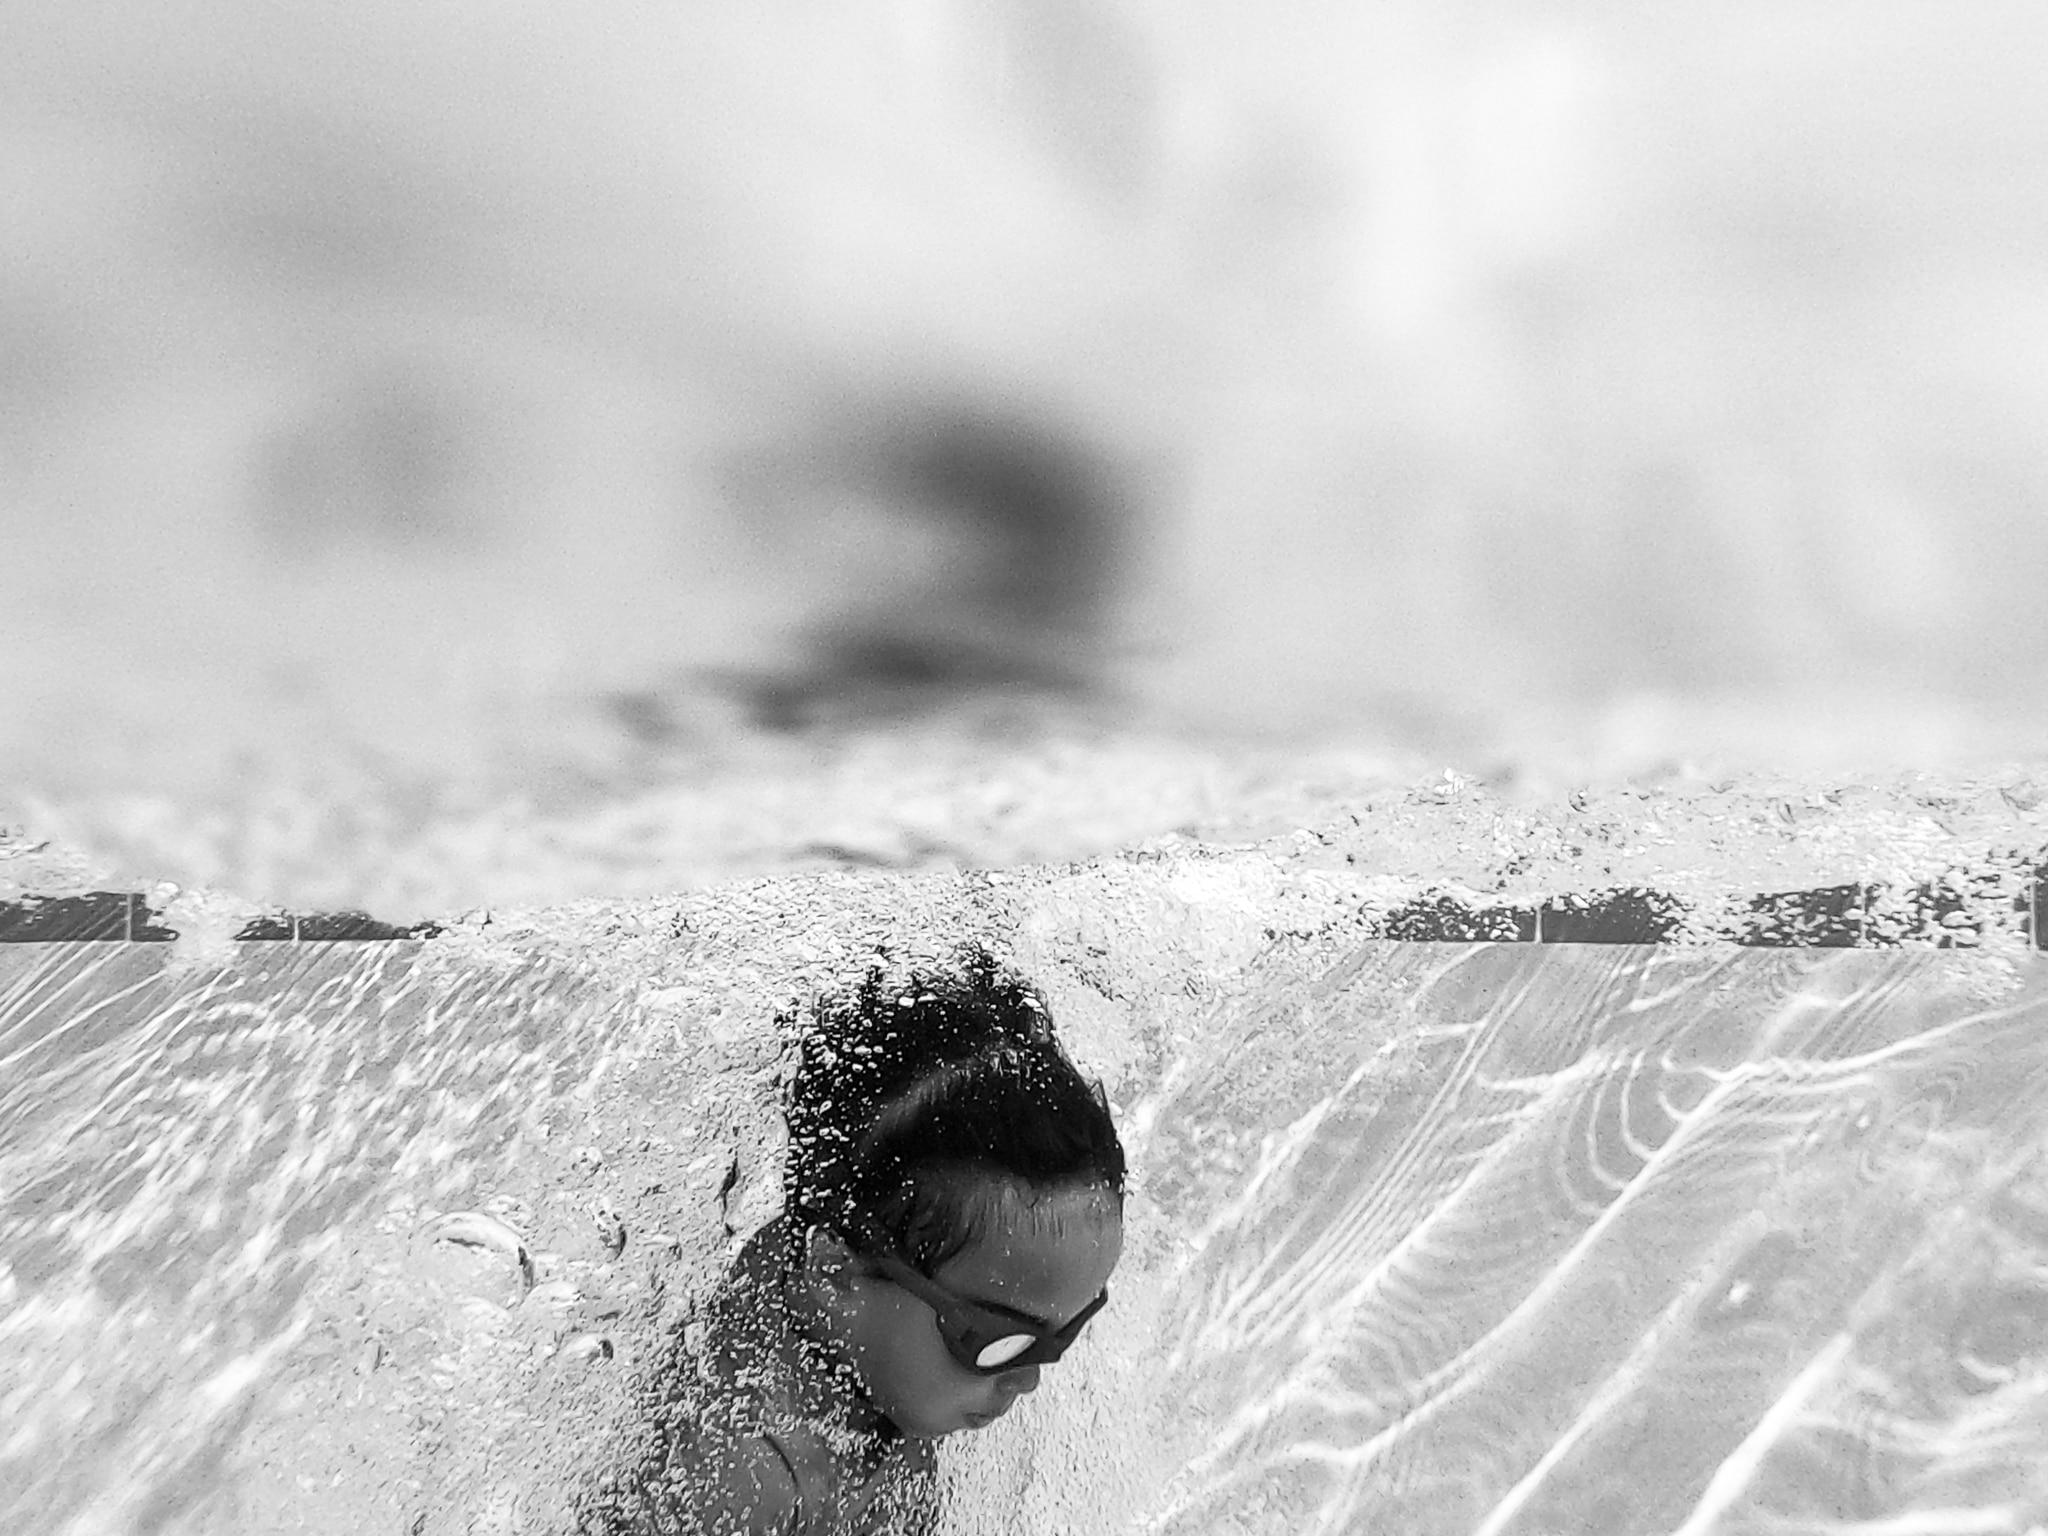 boy jumps in water